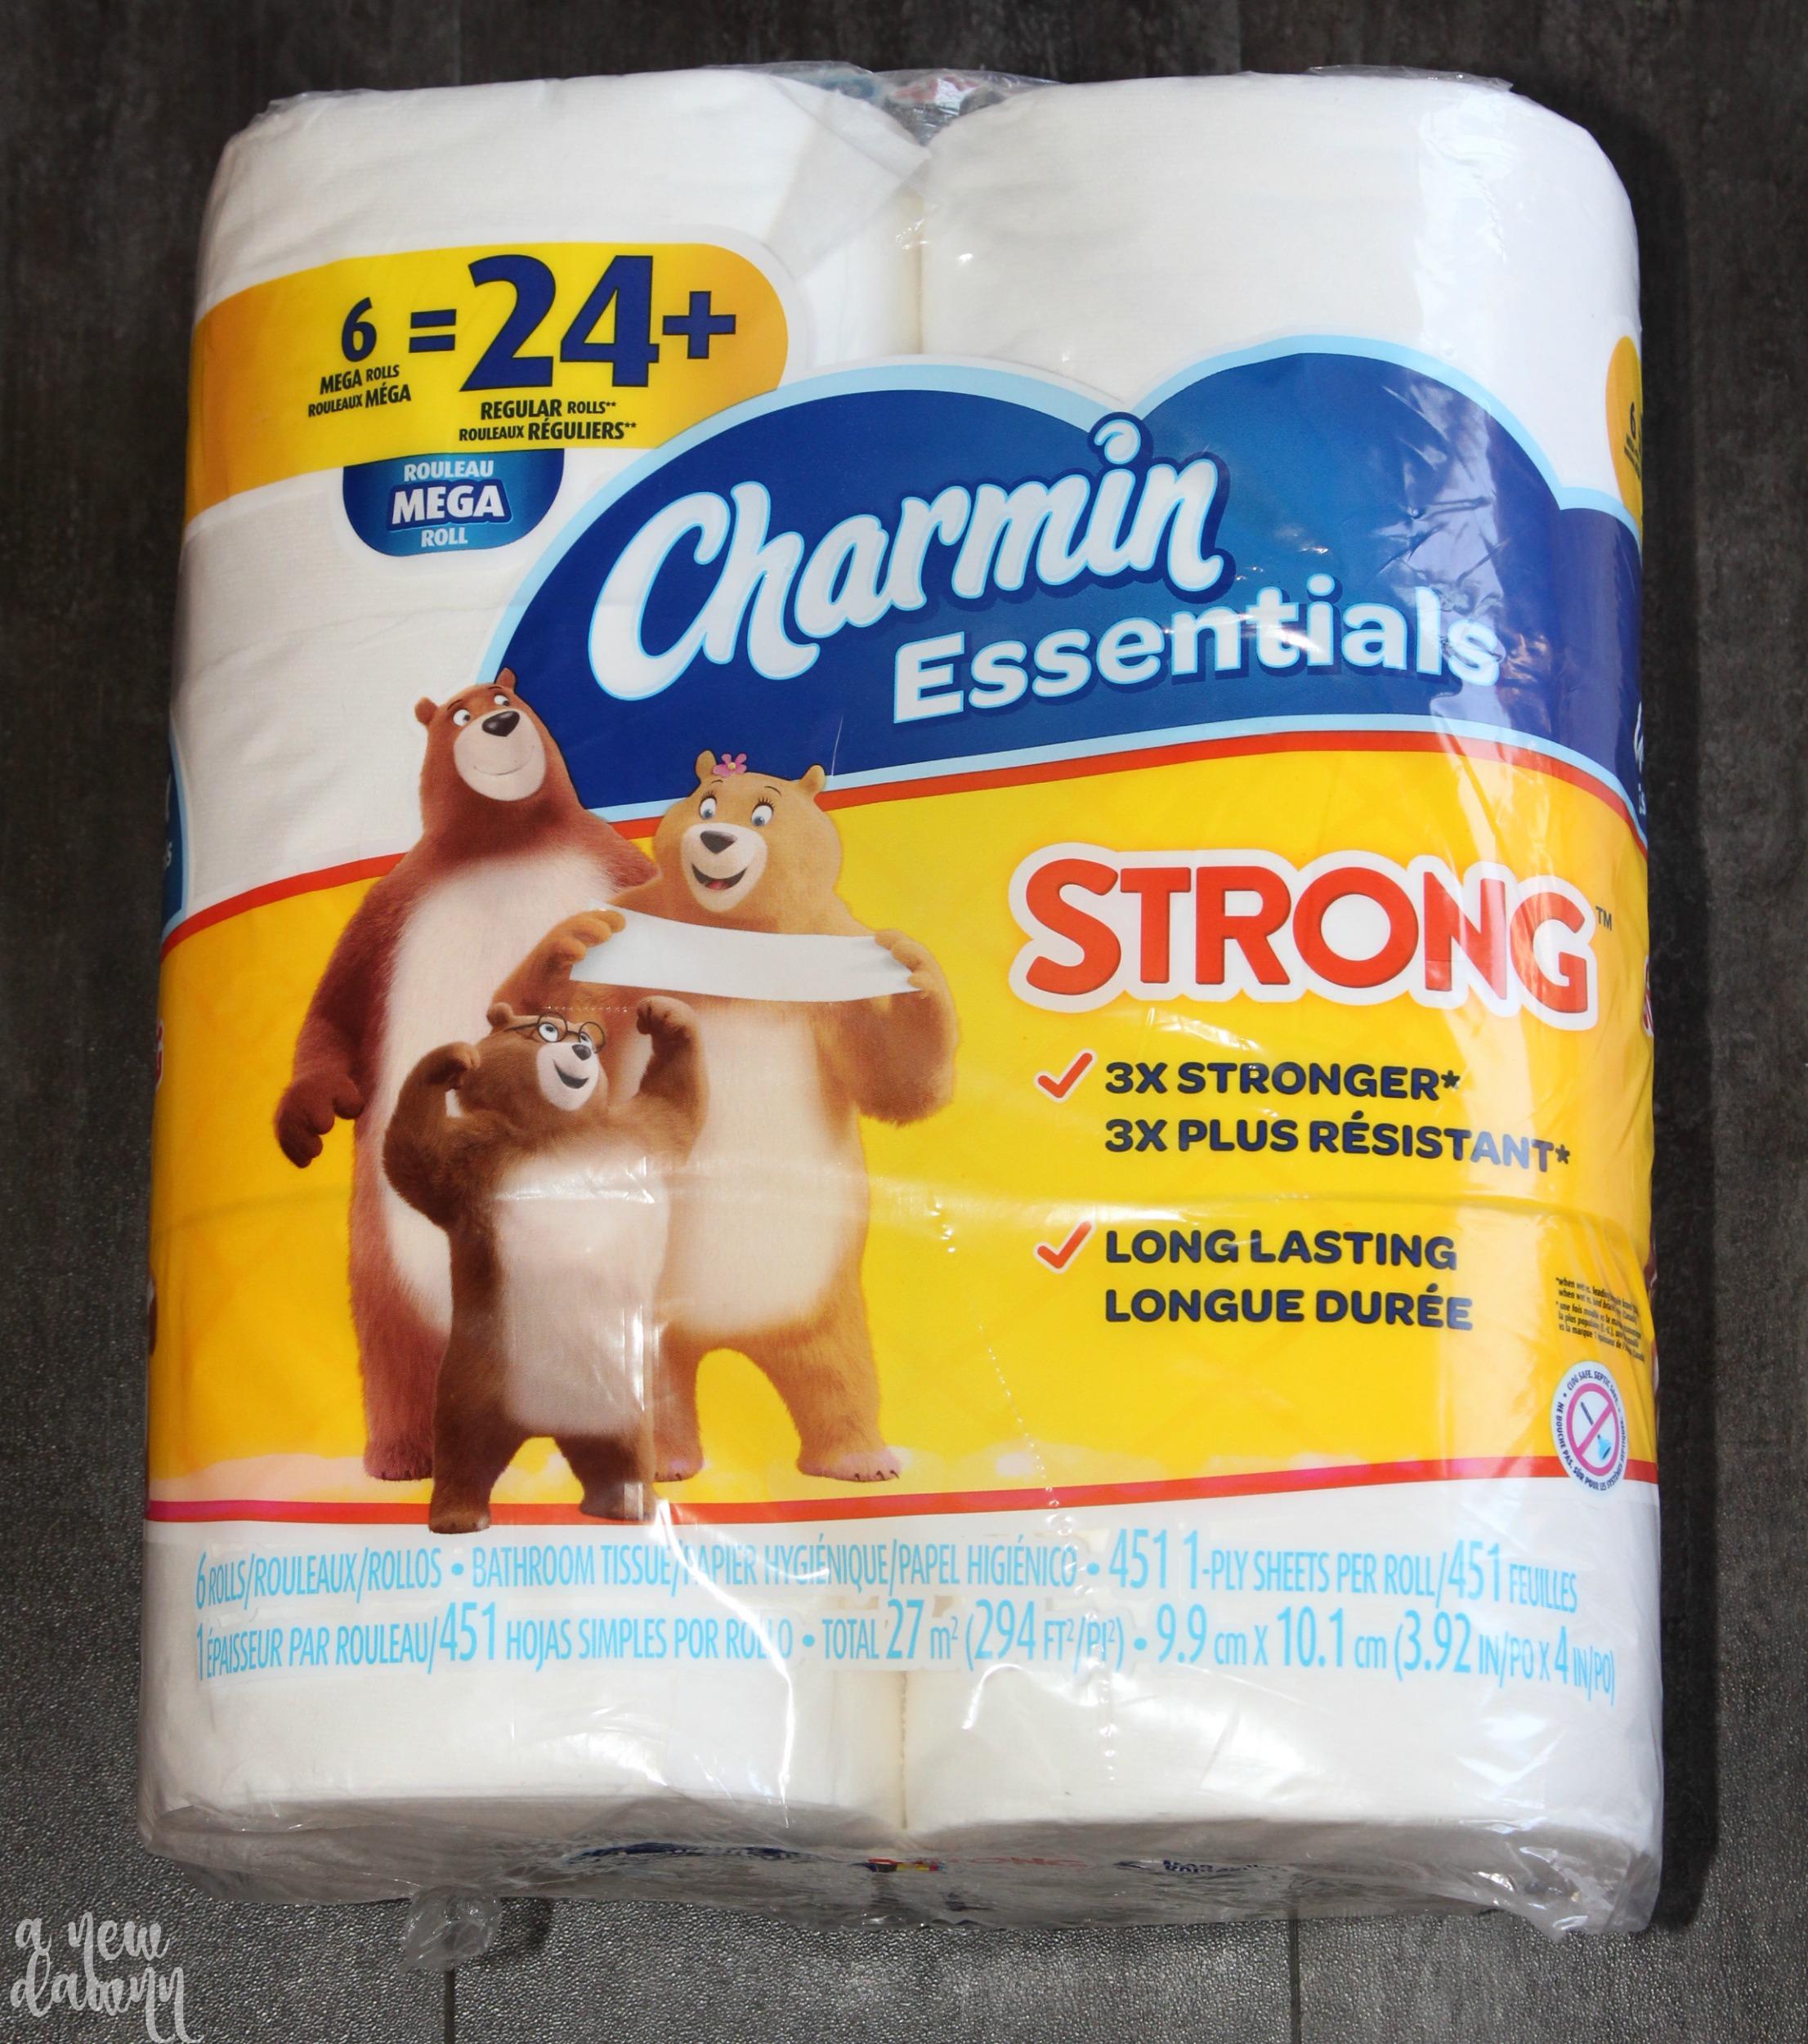 Charmin-Essentials-Strong